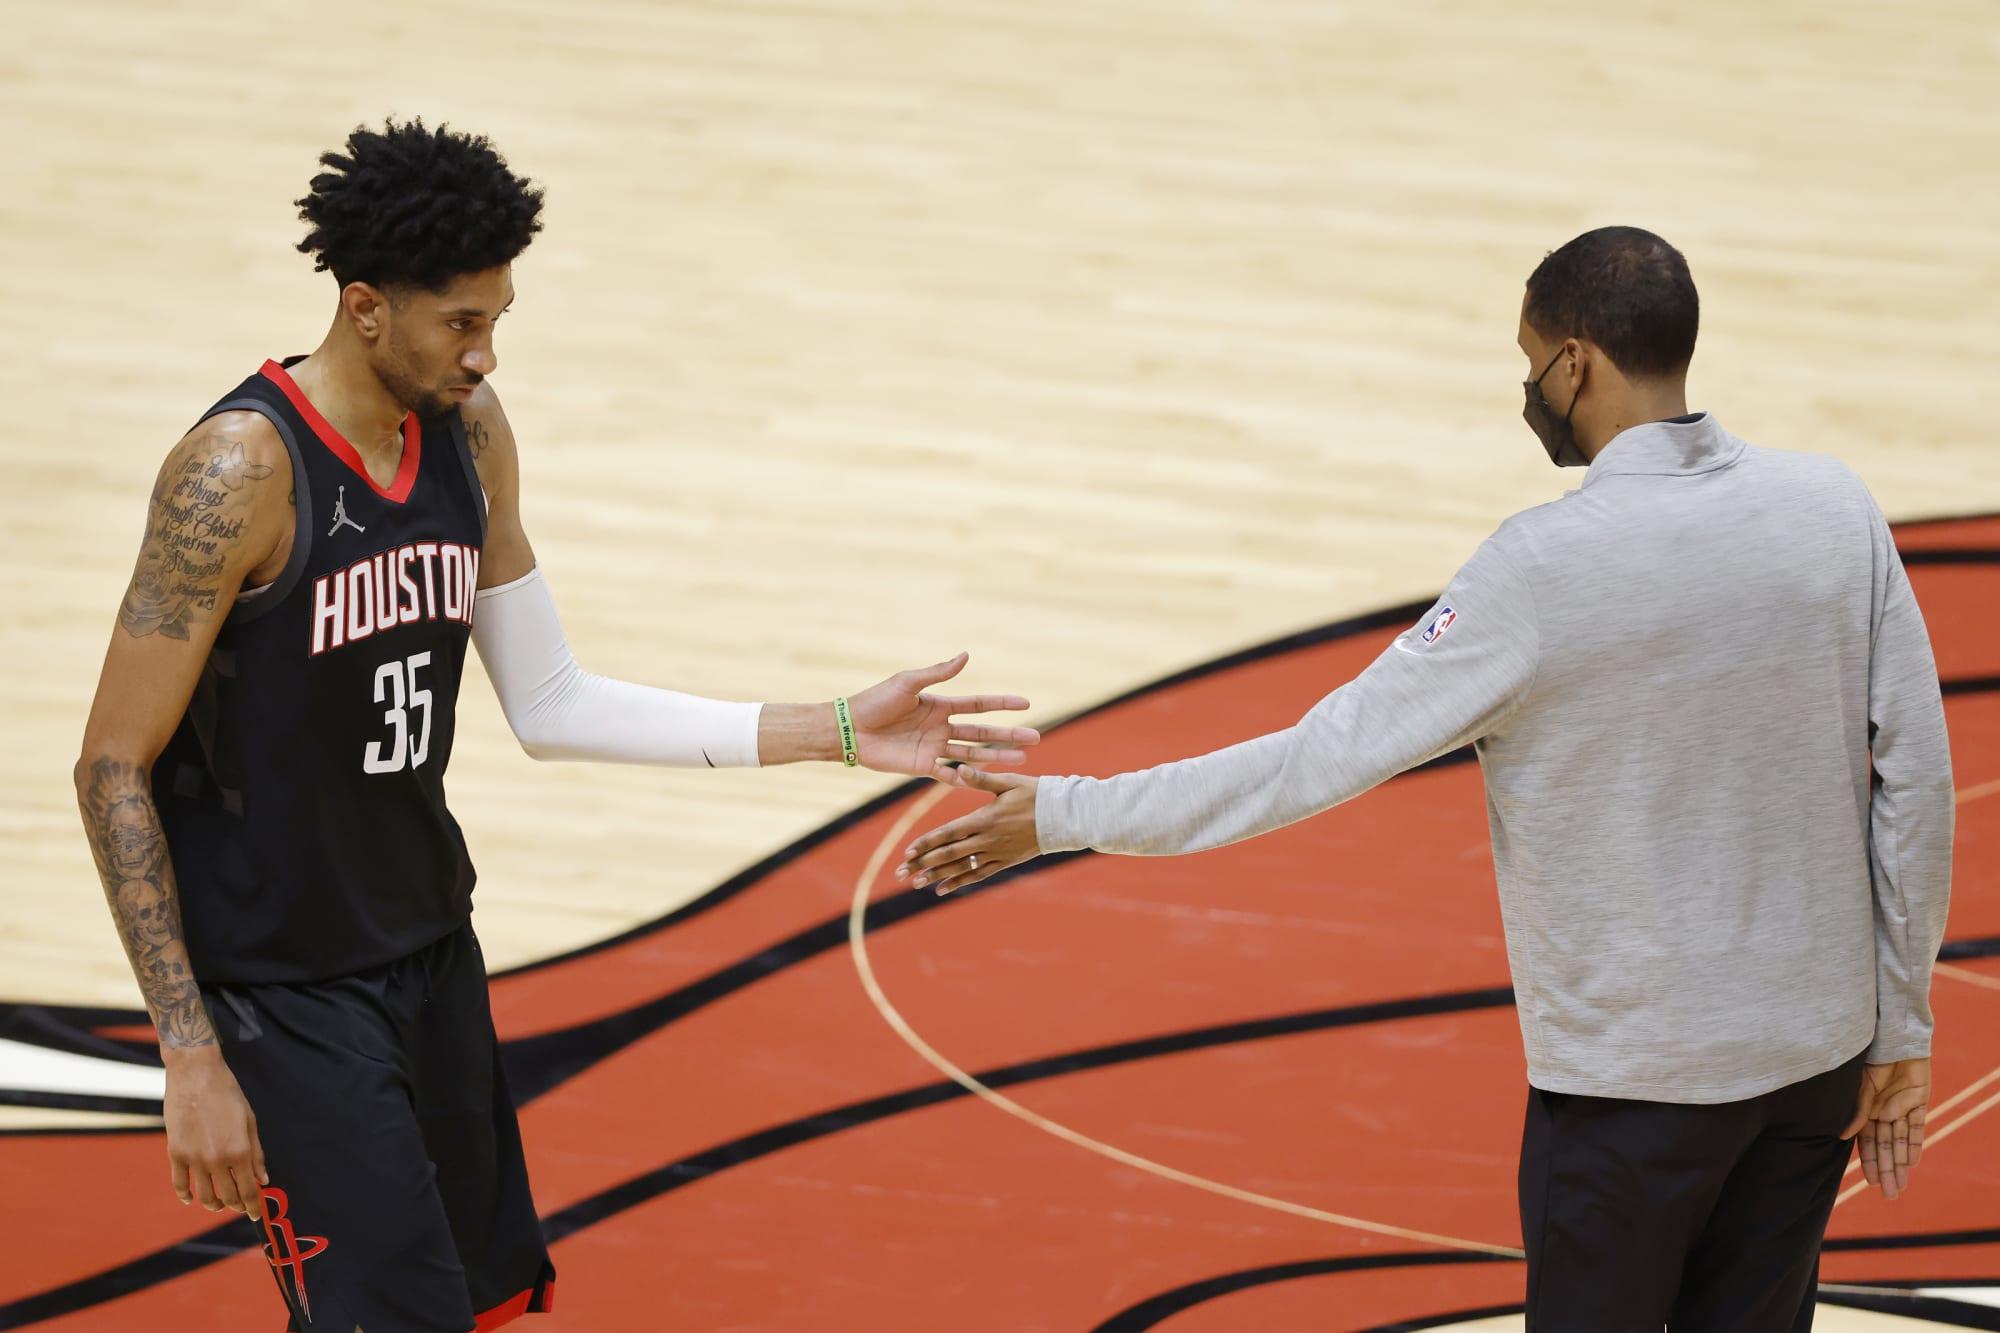 Rockets: False narrative emerges regarding Christian Wood, Rockets